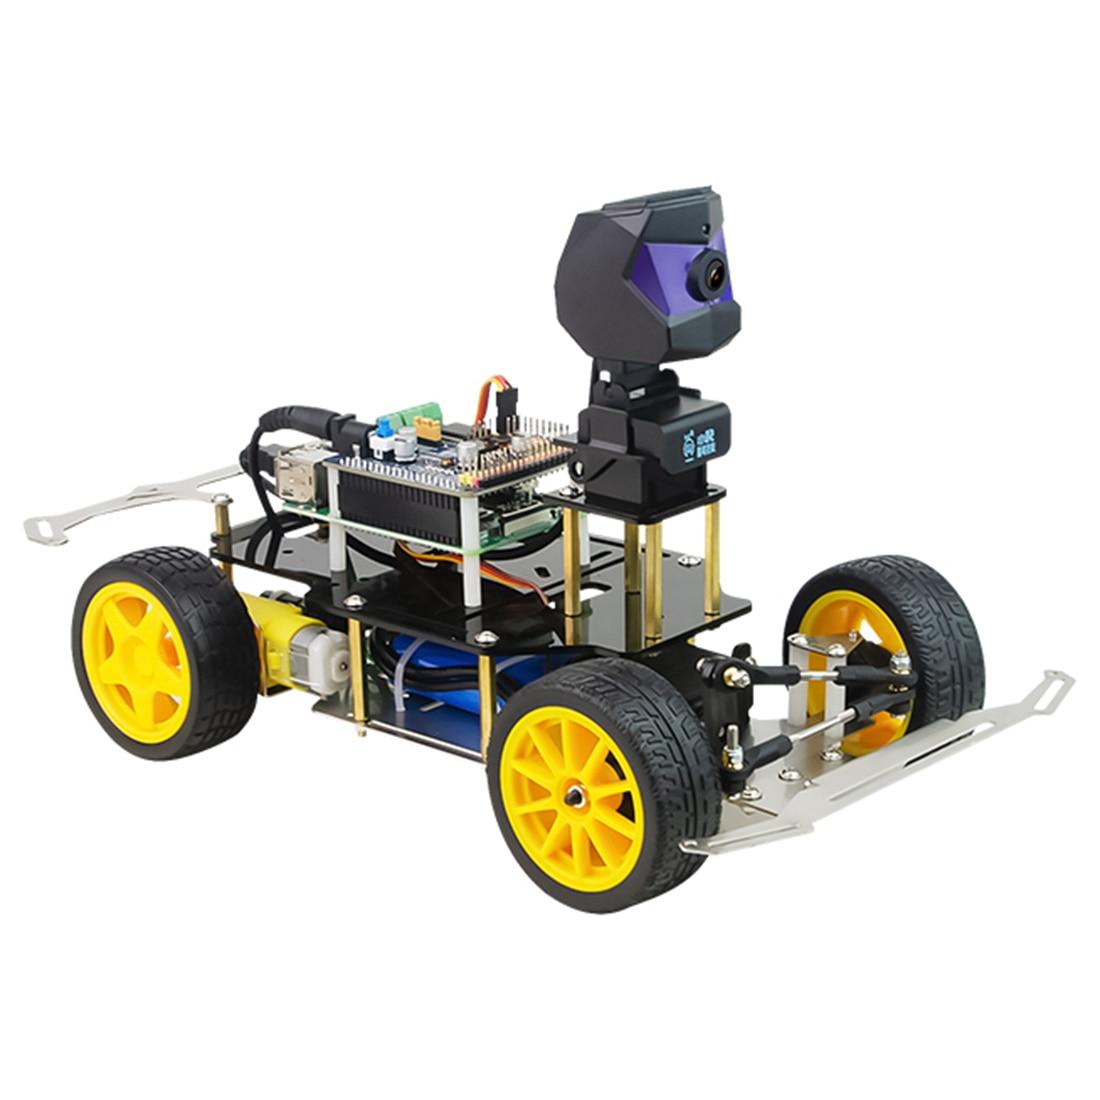 NFSTRIKE Donkey Car Smart AI Line Follower Robot Opensource DIY Self Driving Platform For Raspberry Pi RC Car  Programmable Toys